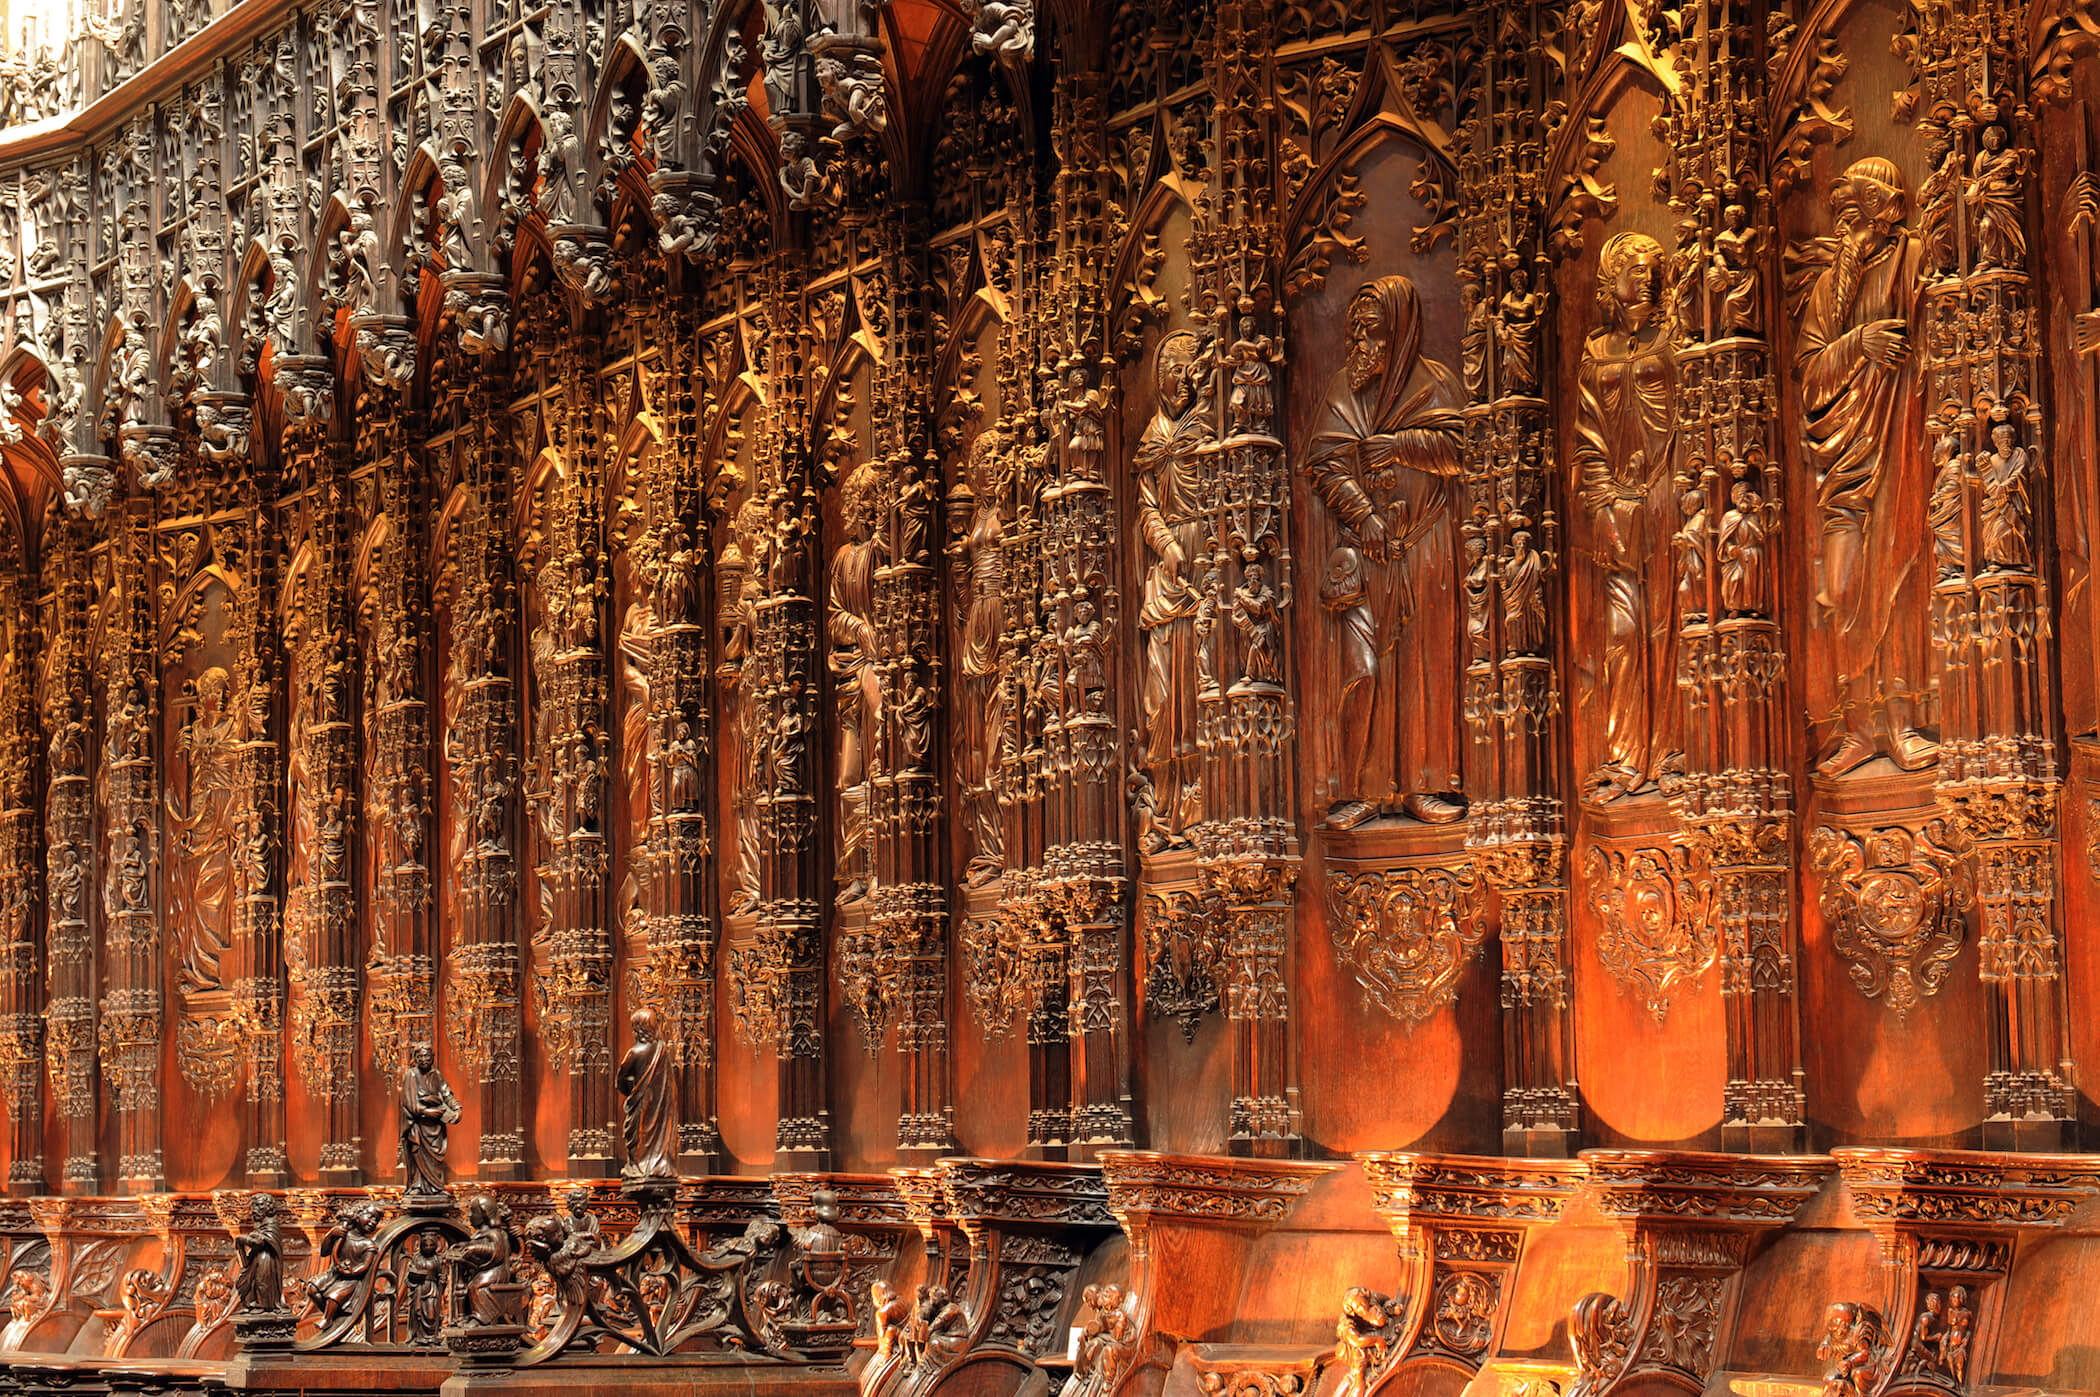 Cathédrale Sainte-Marie©ACIR / JJ Gelbart